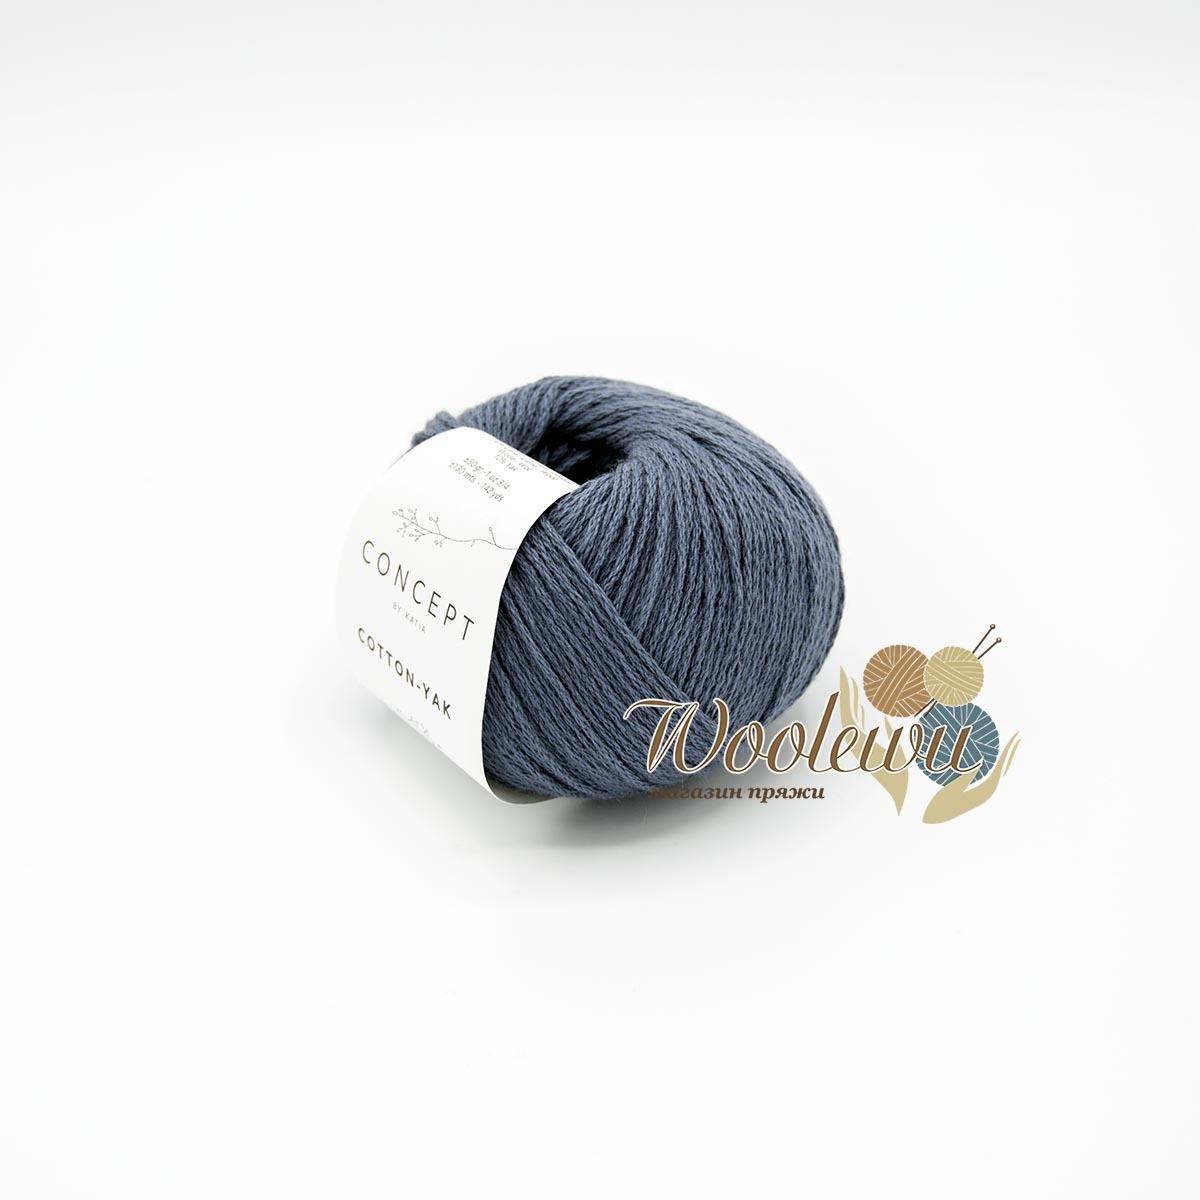 Katia Concept Cotton Yak - 116